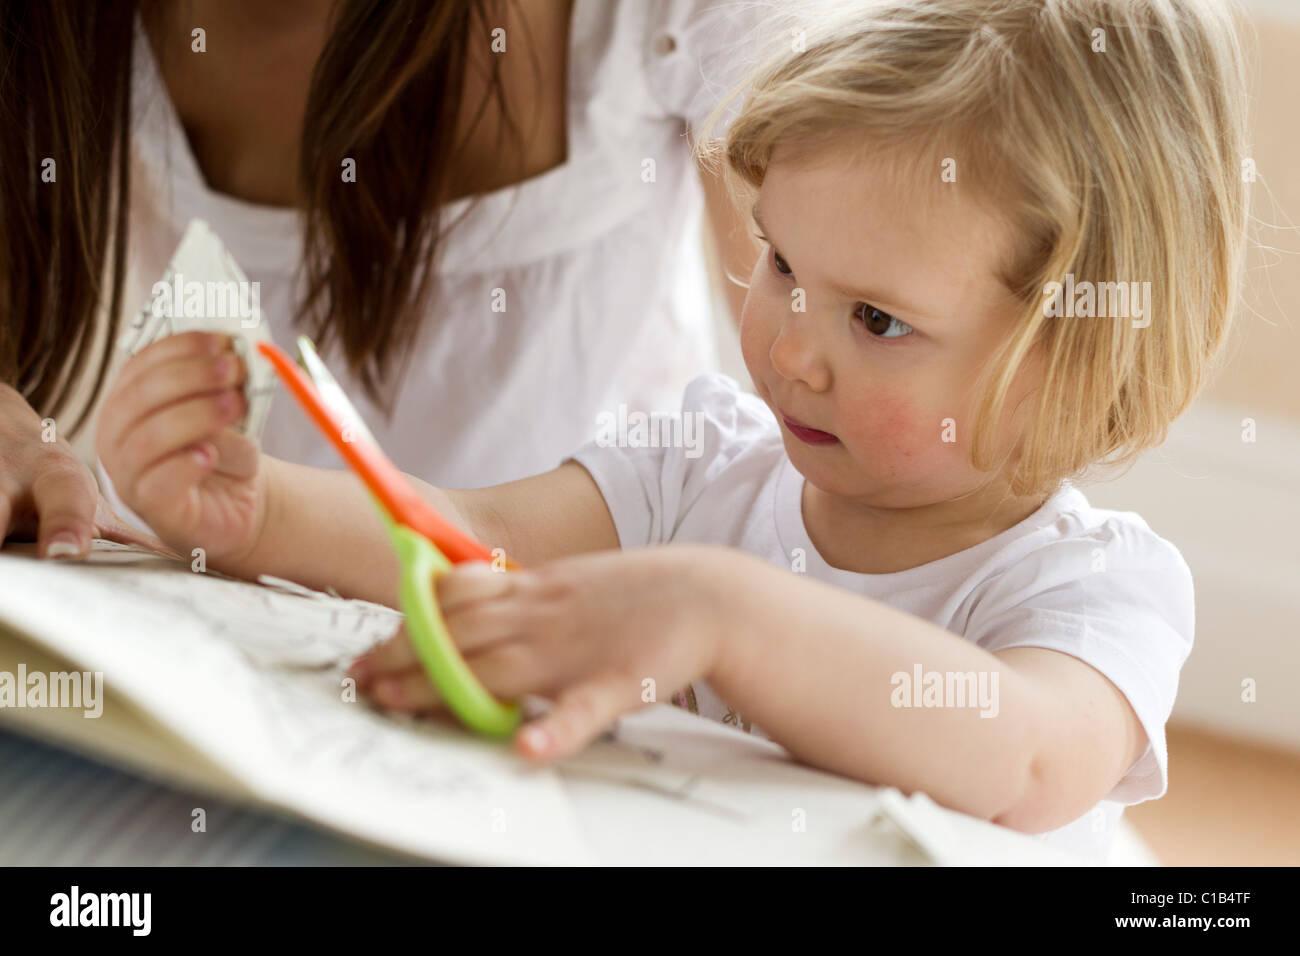 Child using scissors - Stock Image